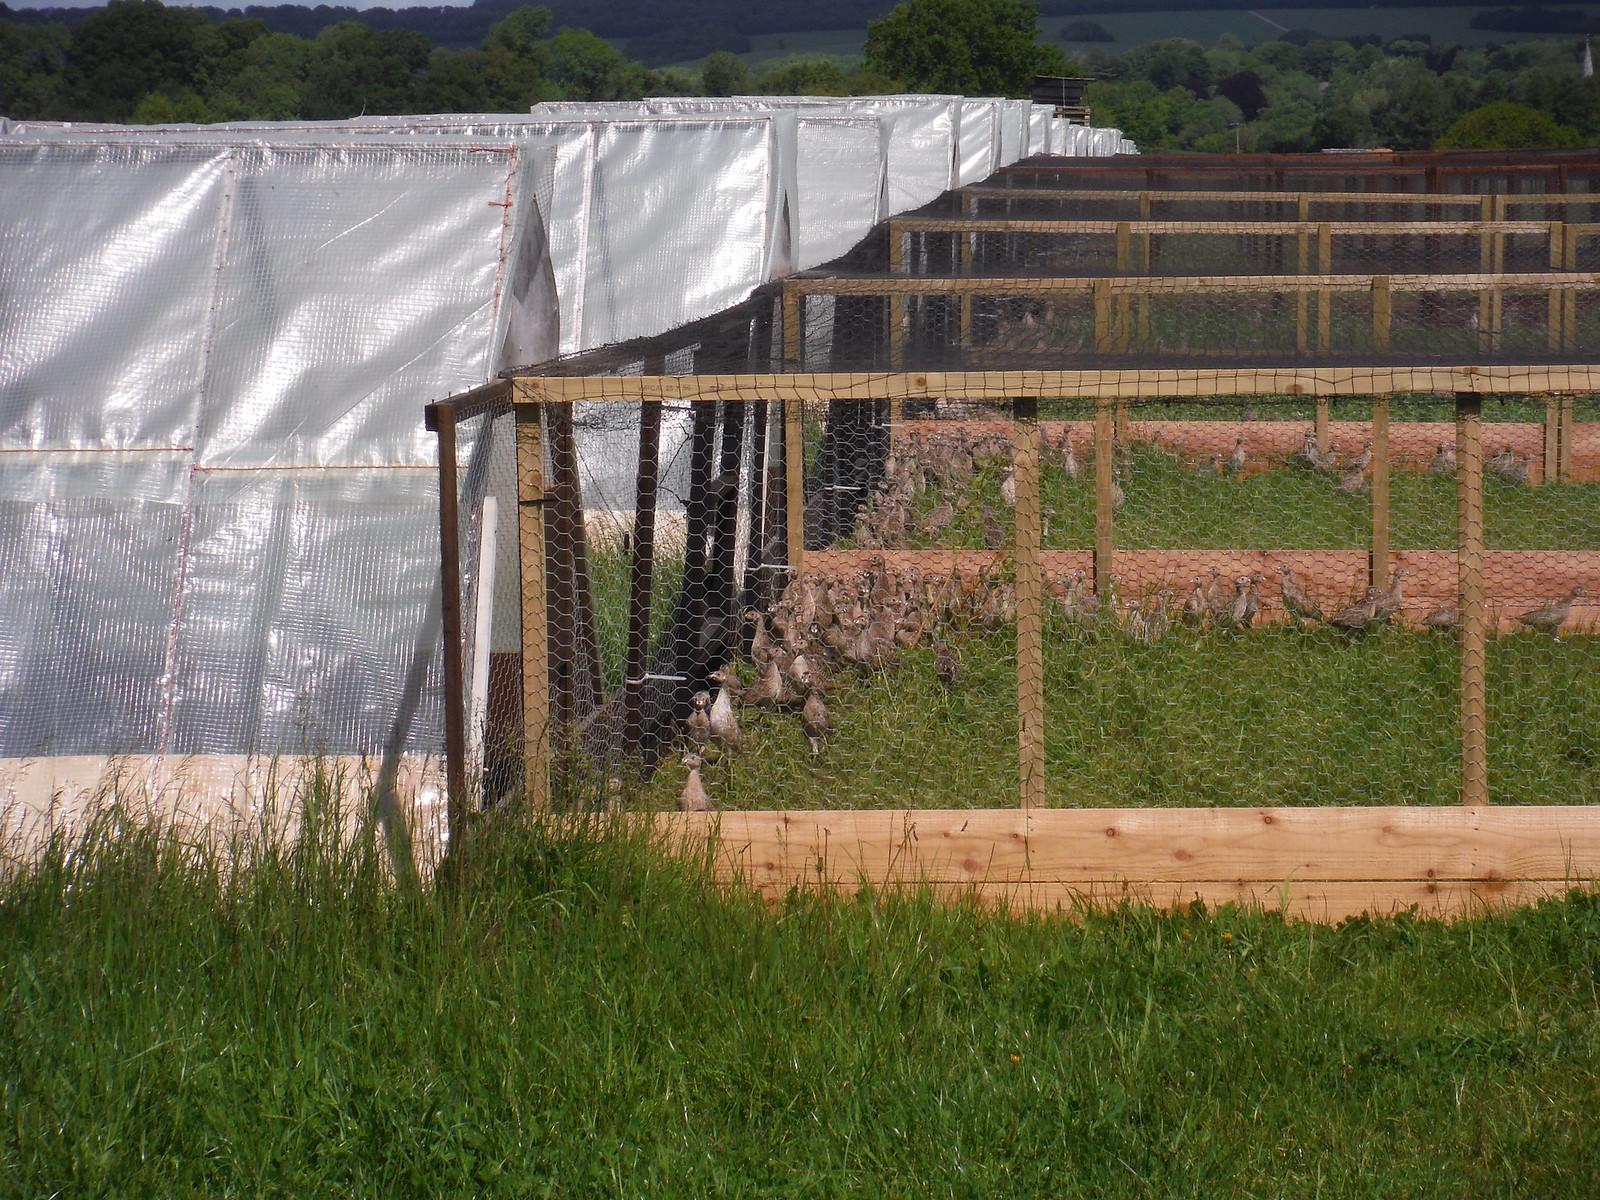 Pheasant Farm, Chilmark Common SWC Walk 249 Tisbury Circular via Dinton and Fovant